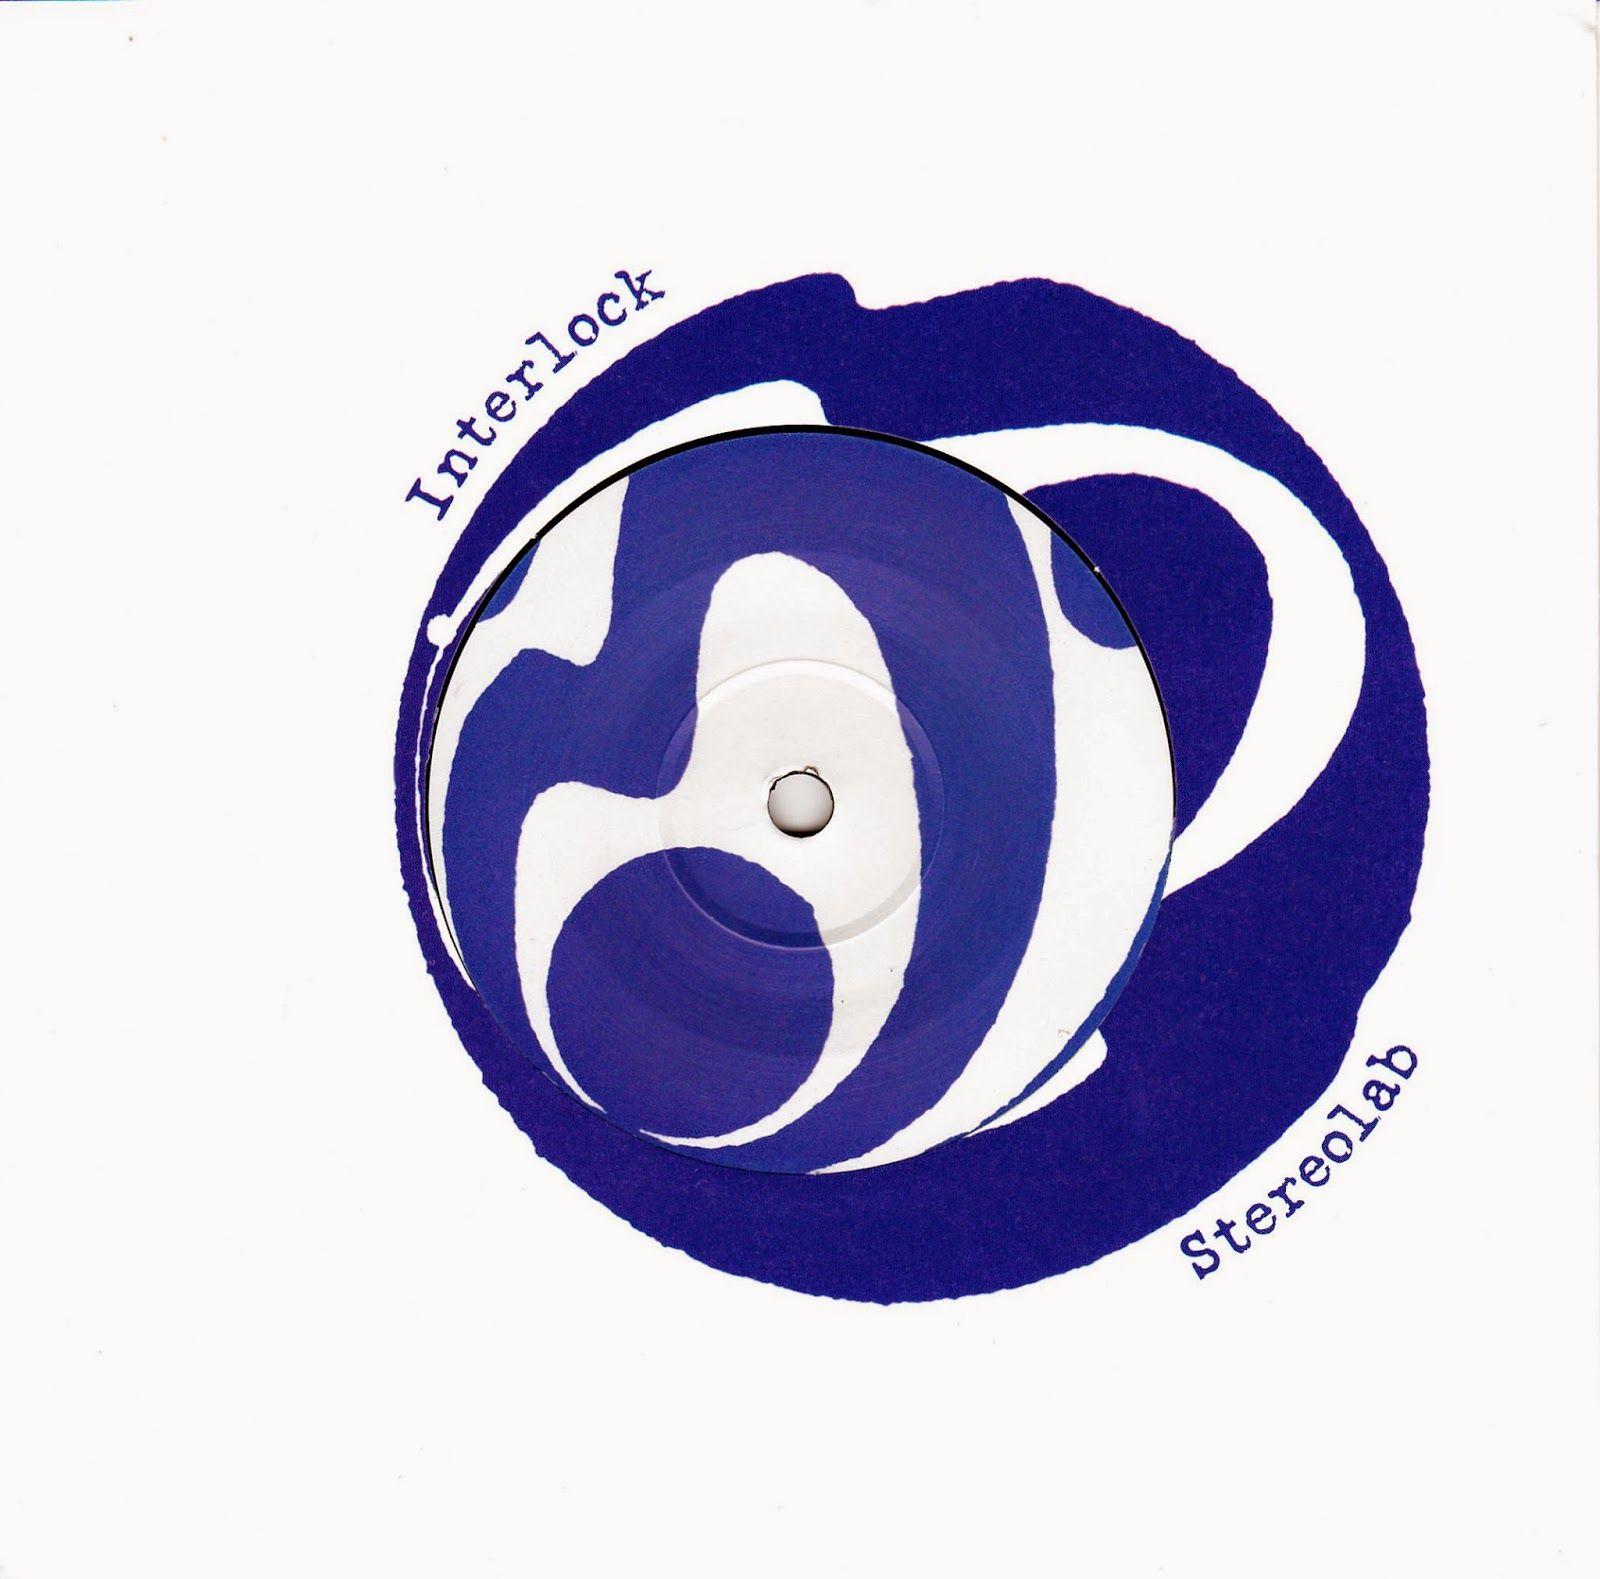 Stereolab - Interlock 7''